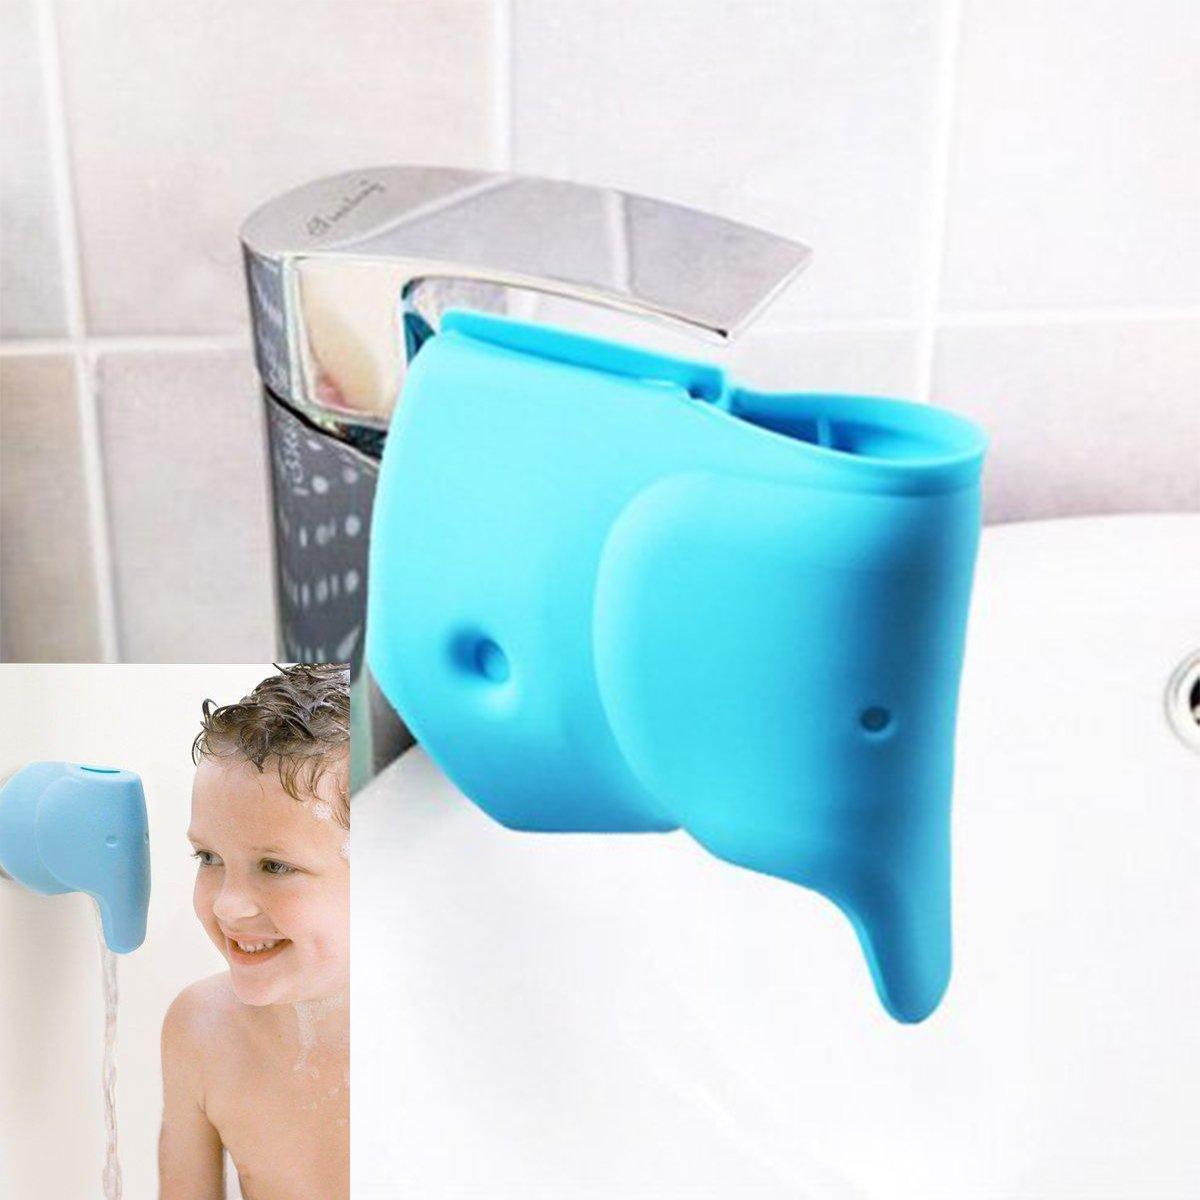 cover for bathtub faucet. amazon.com: llop baby bath spout cover,soft flexible silicone moby faucet cover for your bathtub \u0026 child bathroom accessories r